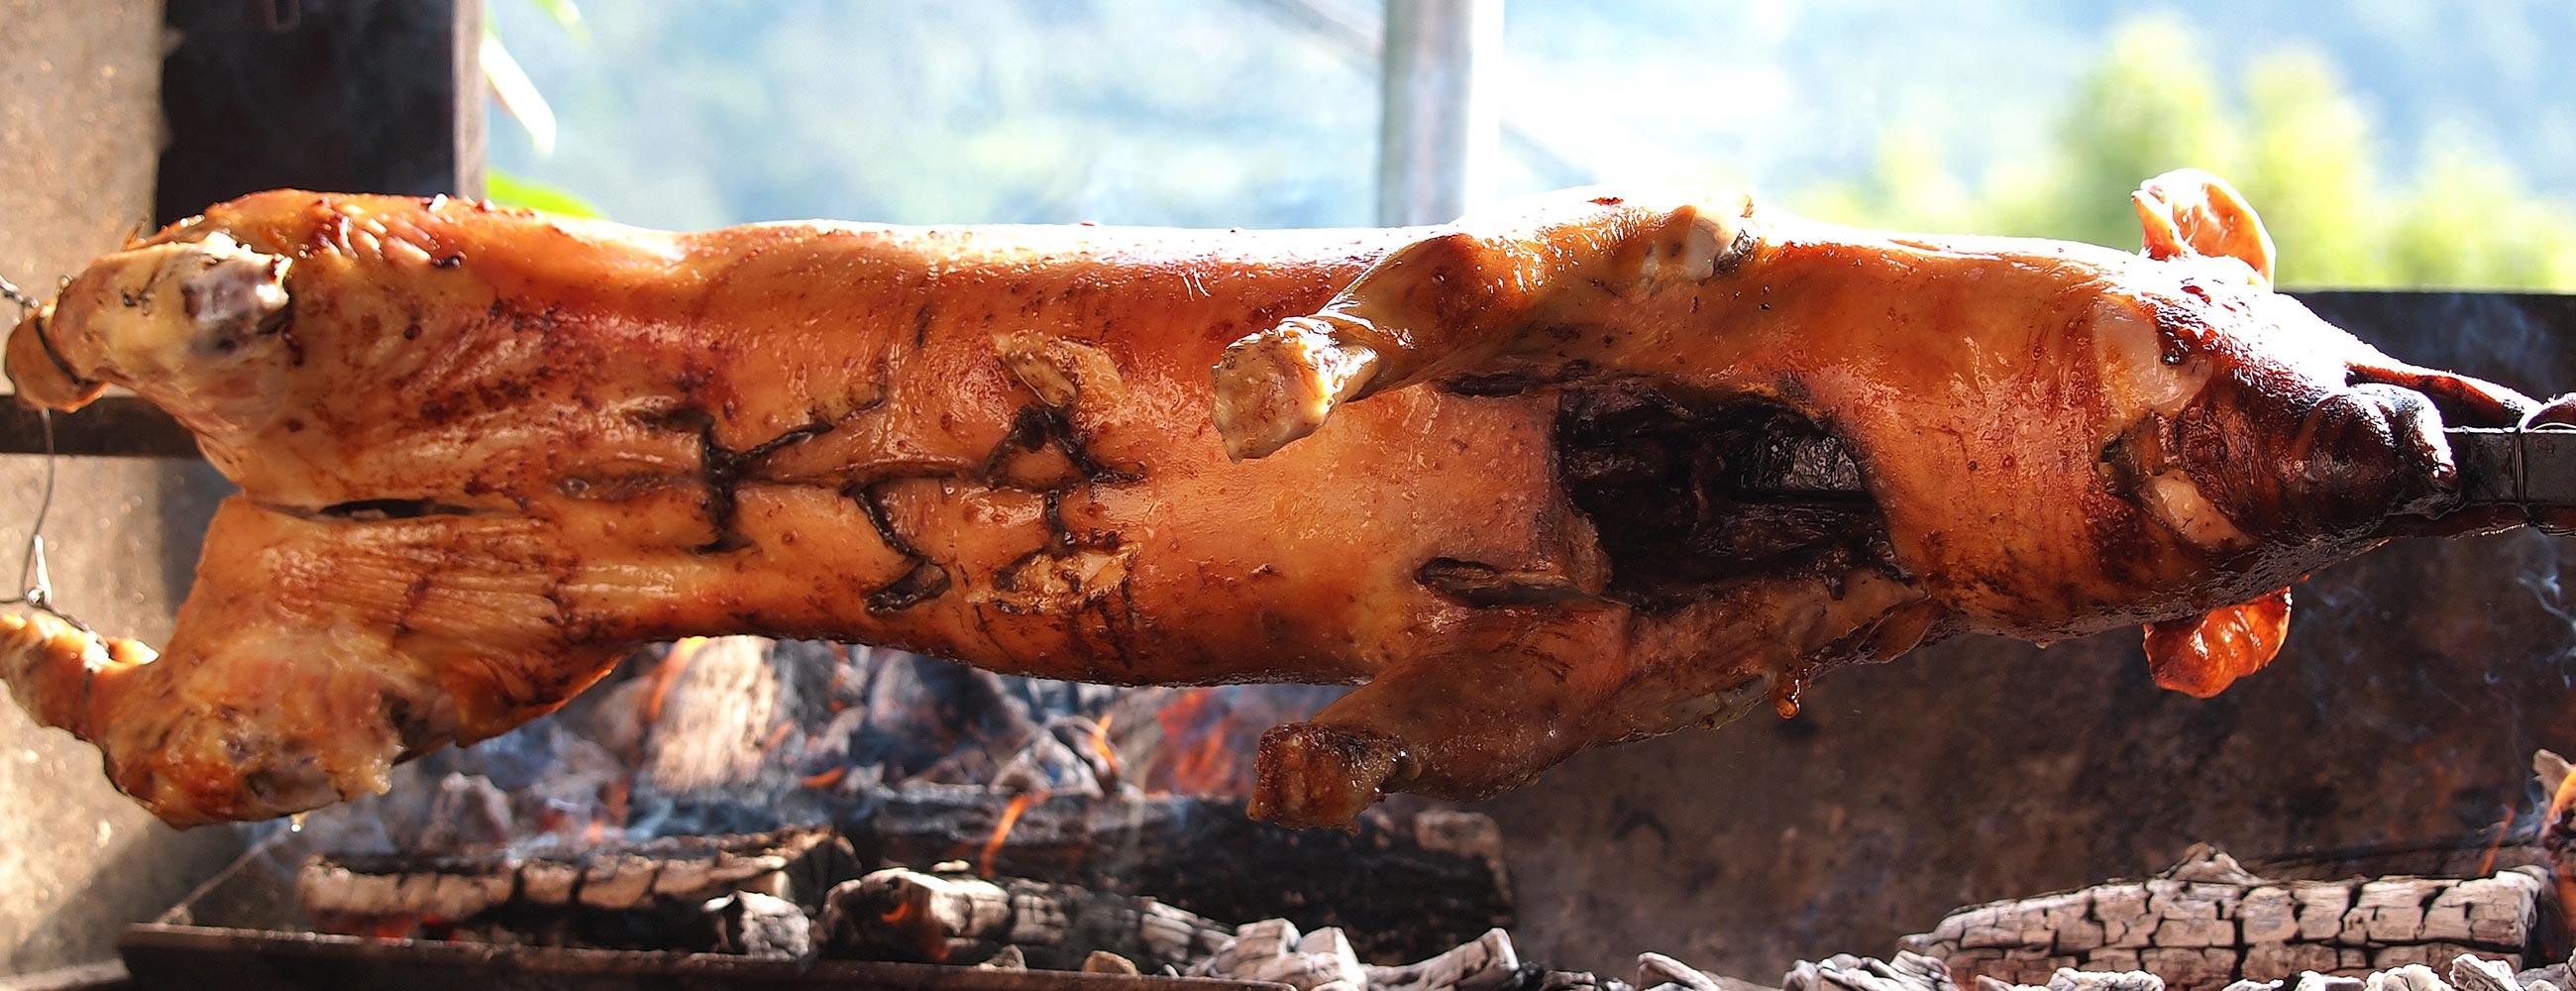 pig roast catering